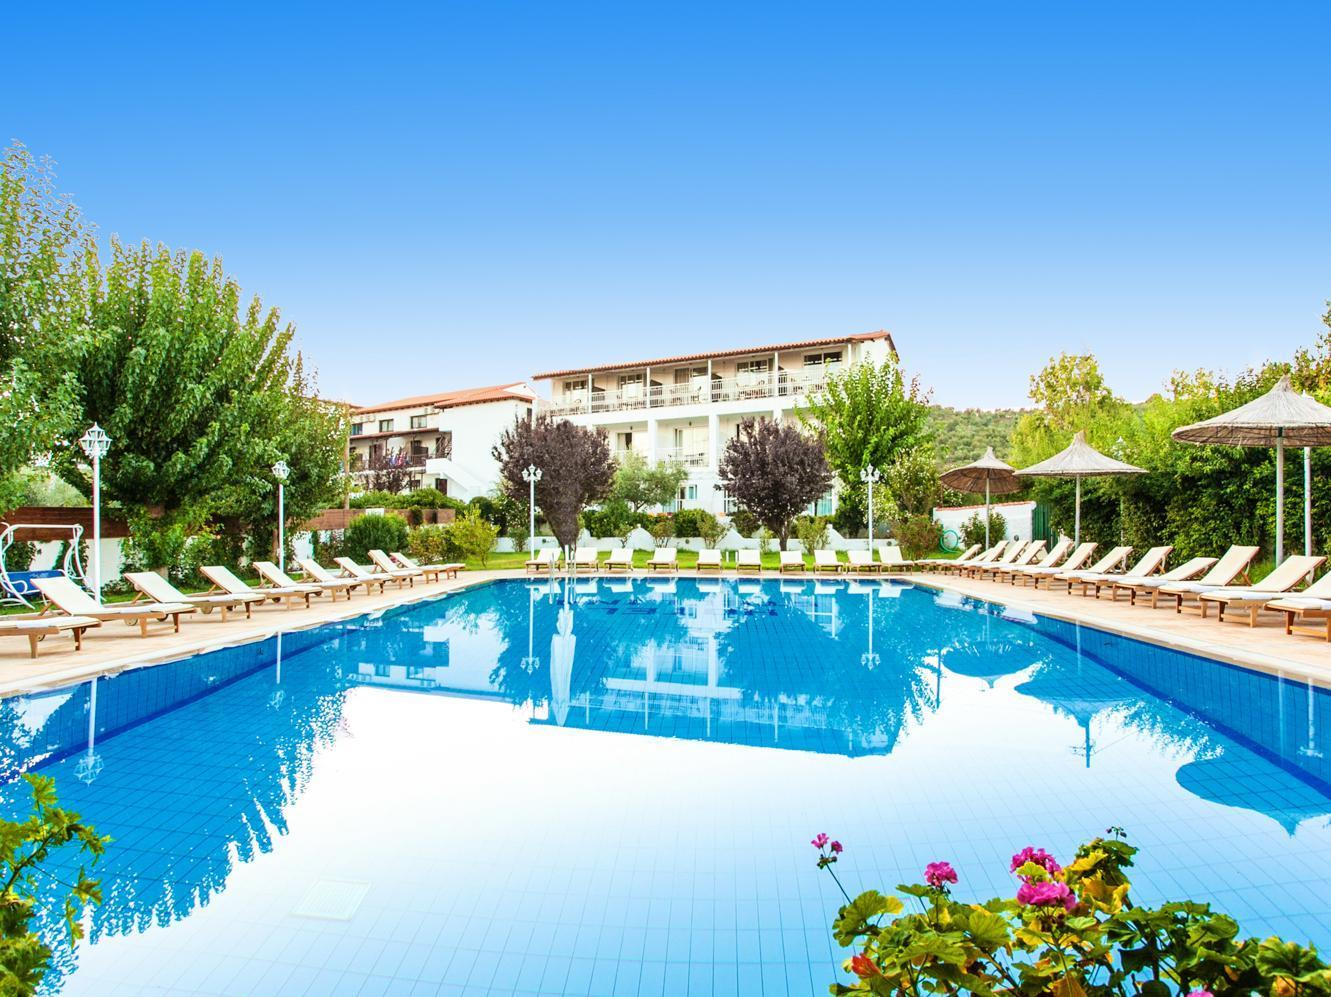 Stellina hotel skiathos town skiathos island greece for Hotel skiathos